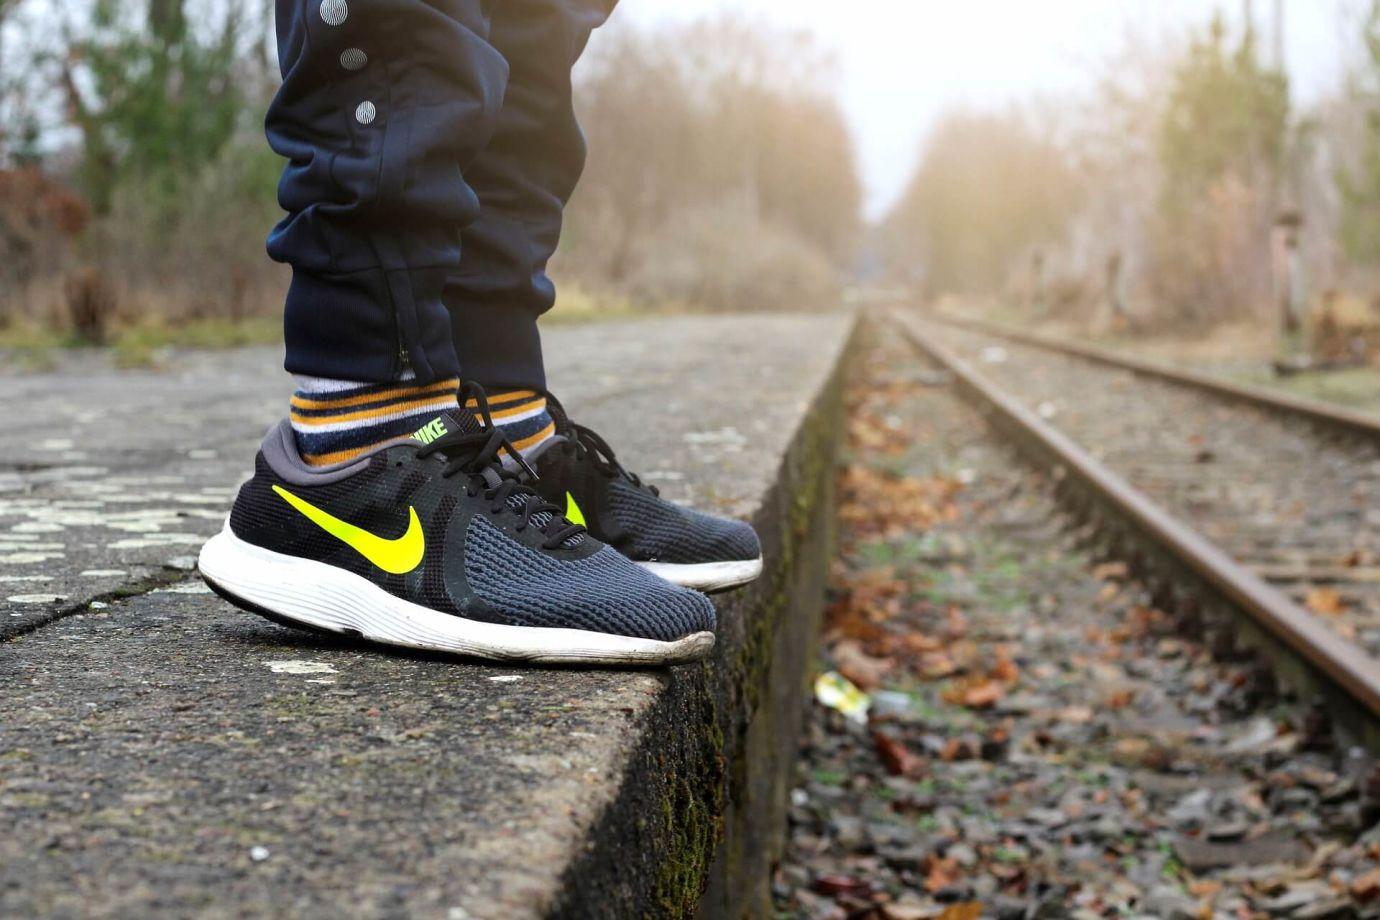 Schwarze Nike Sneaker mit Heel Cap auf Bahnsteig